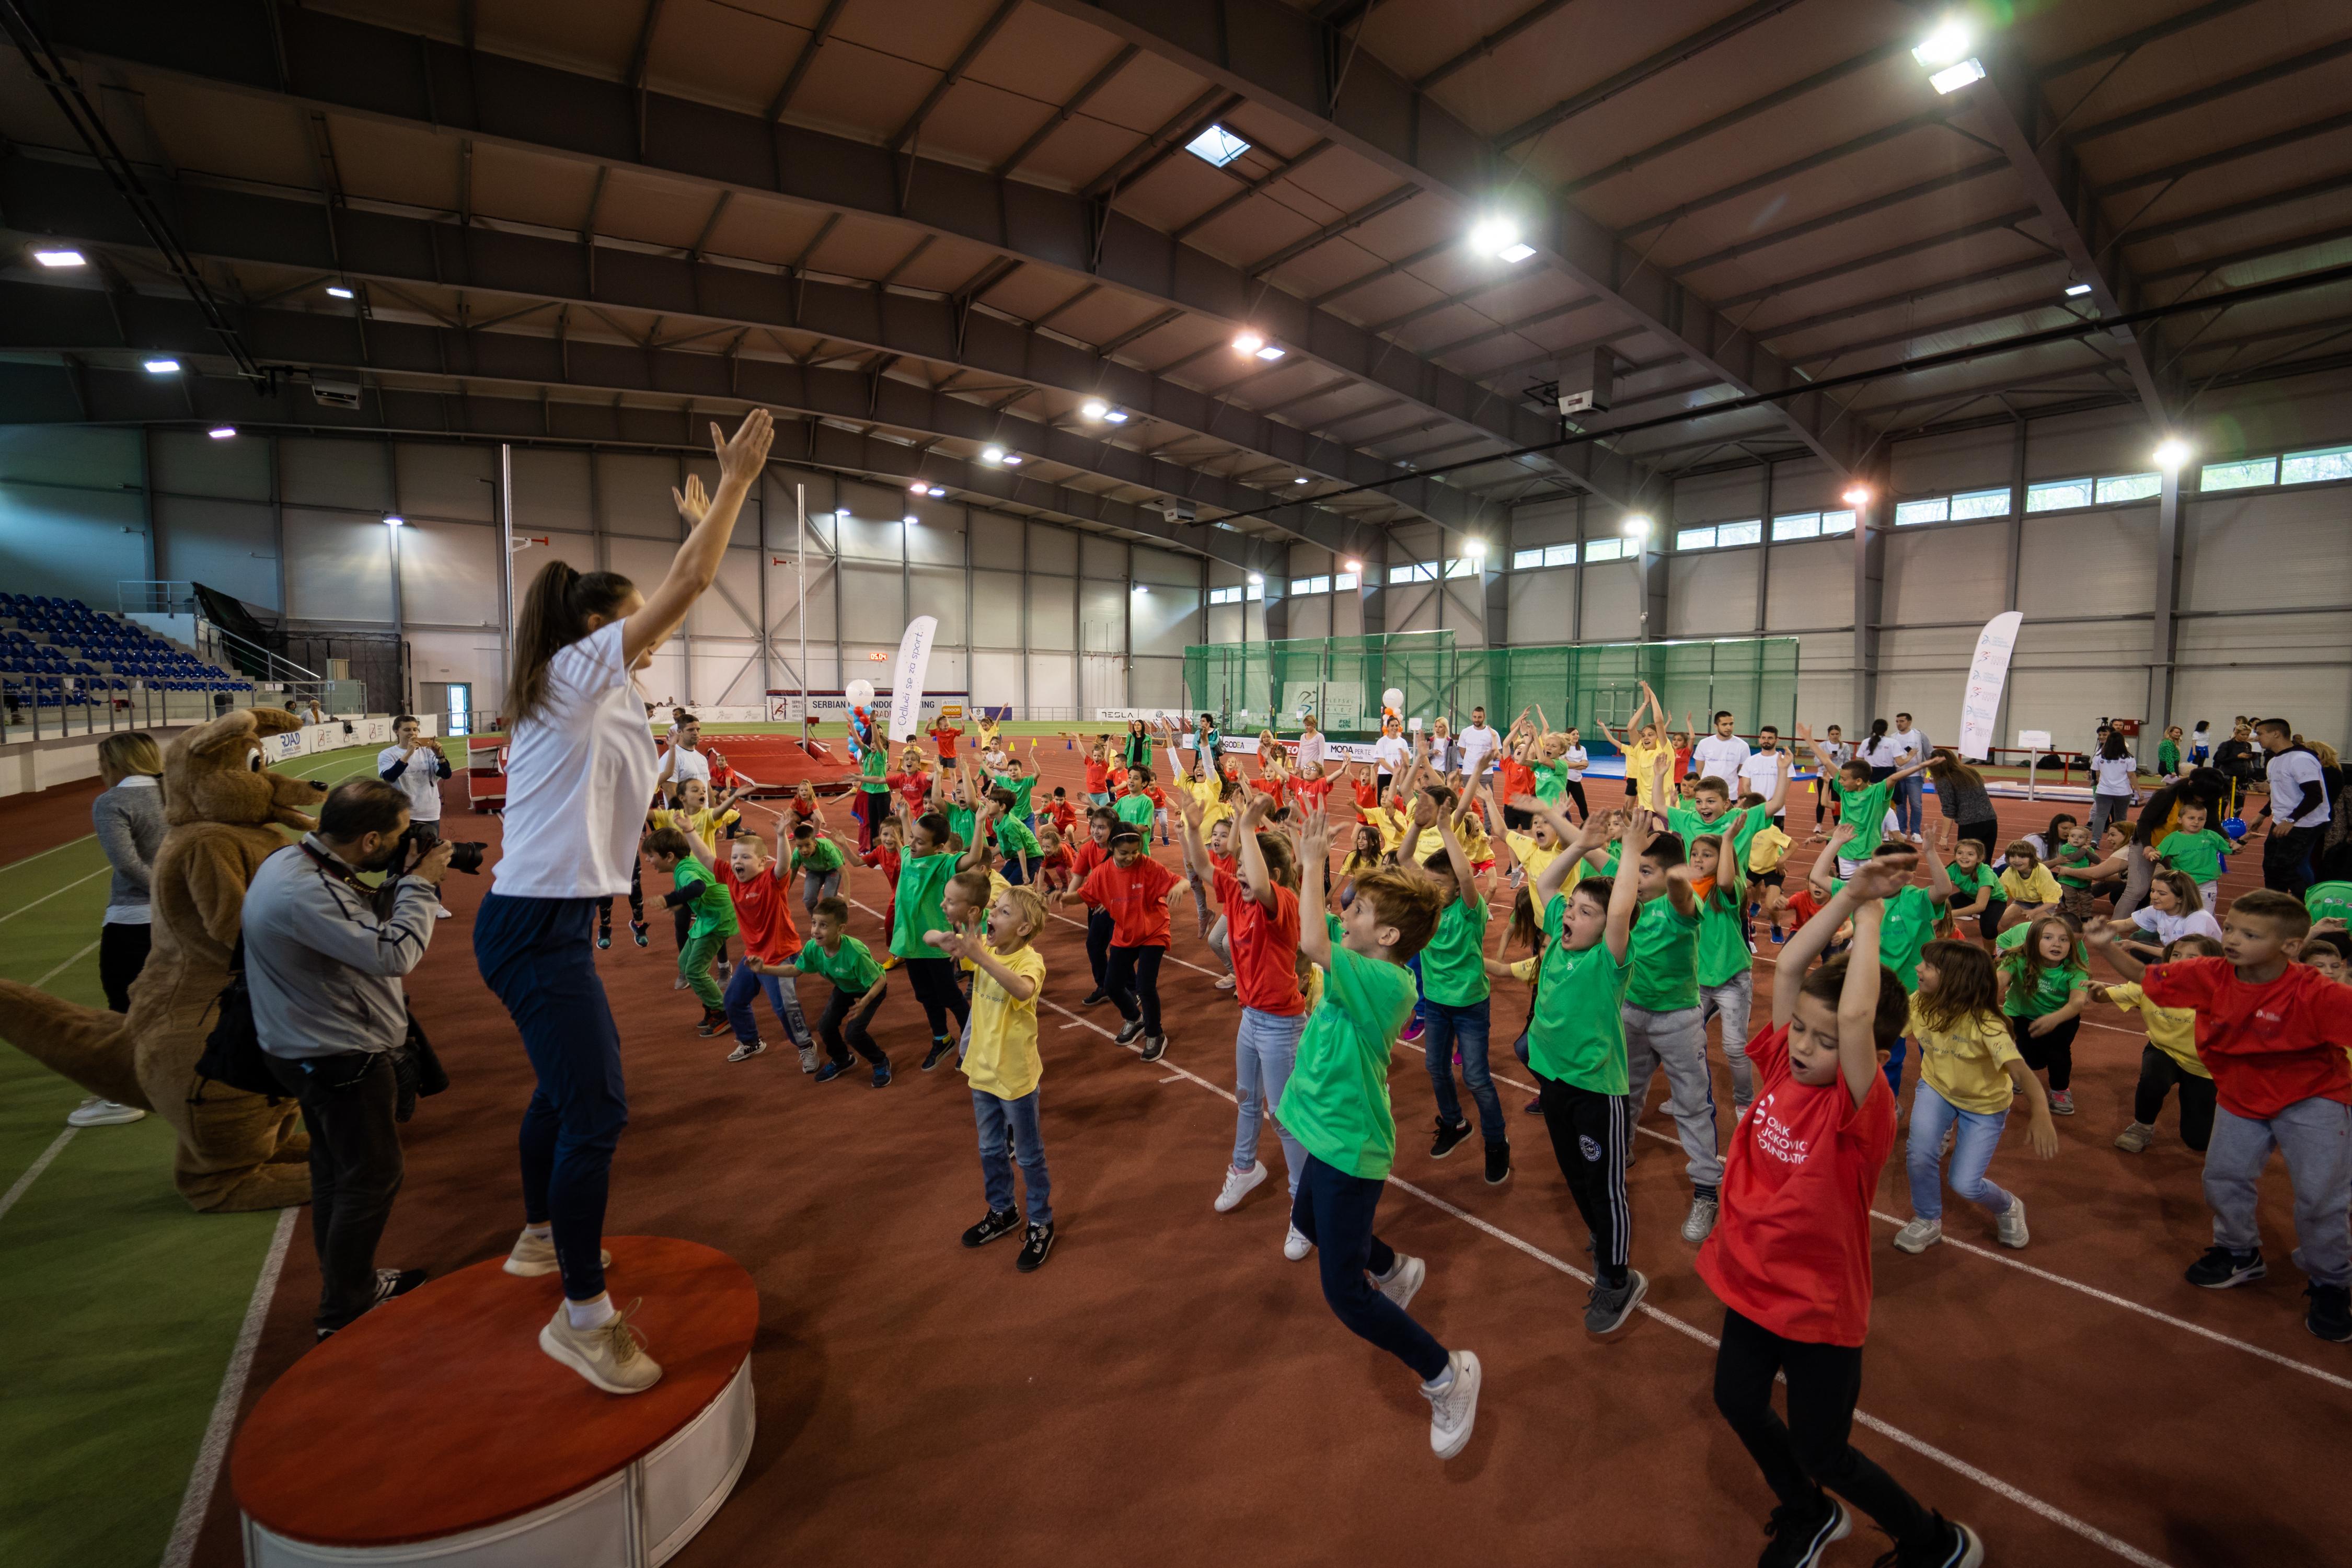 More than 150 children enjoyed various sports activityes.